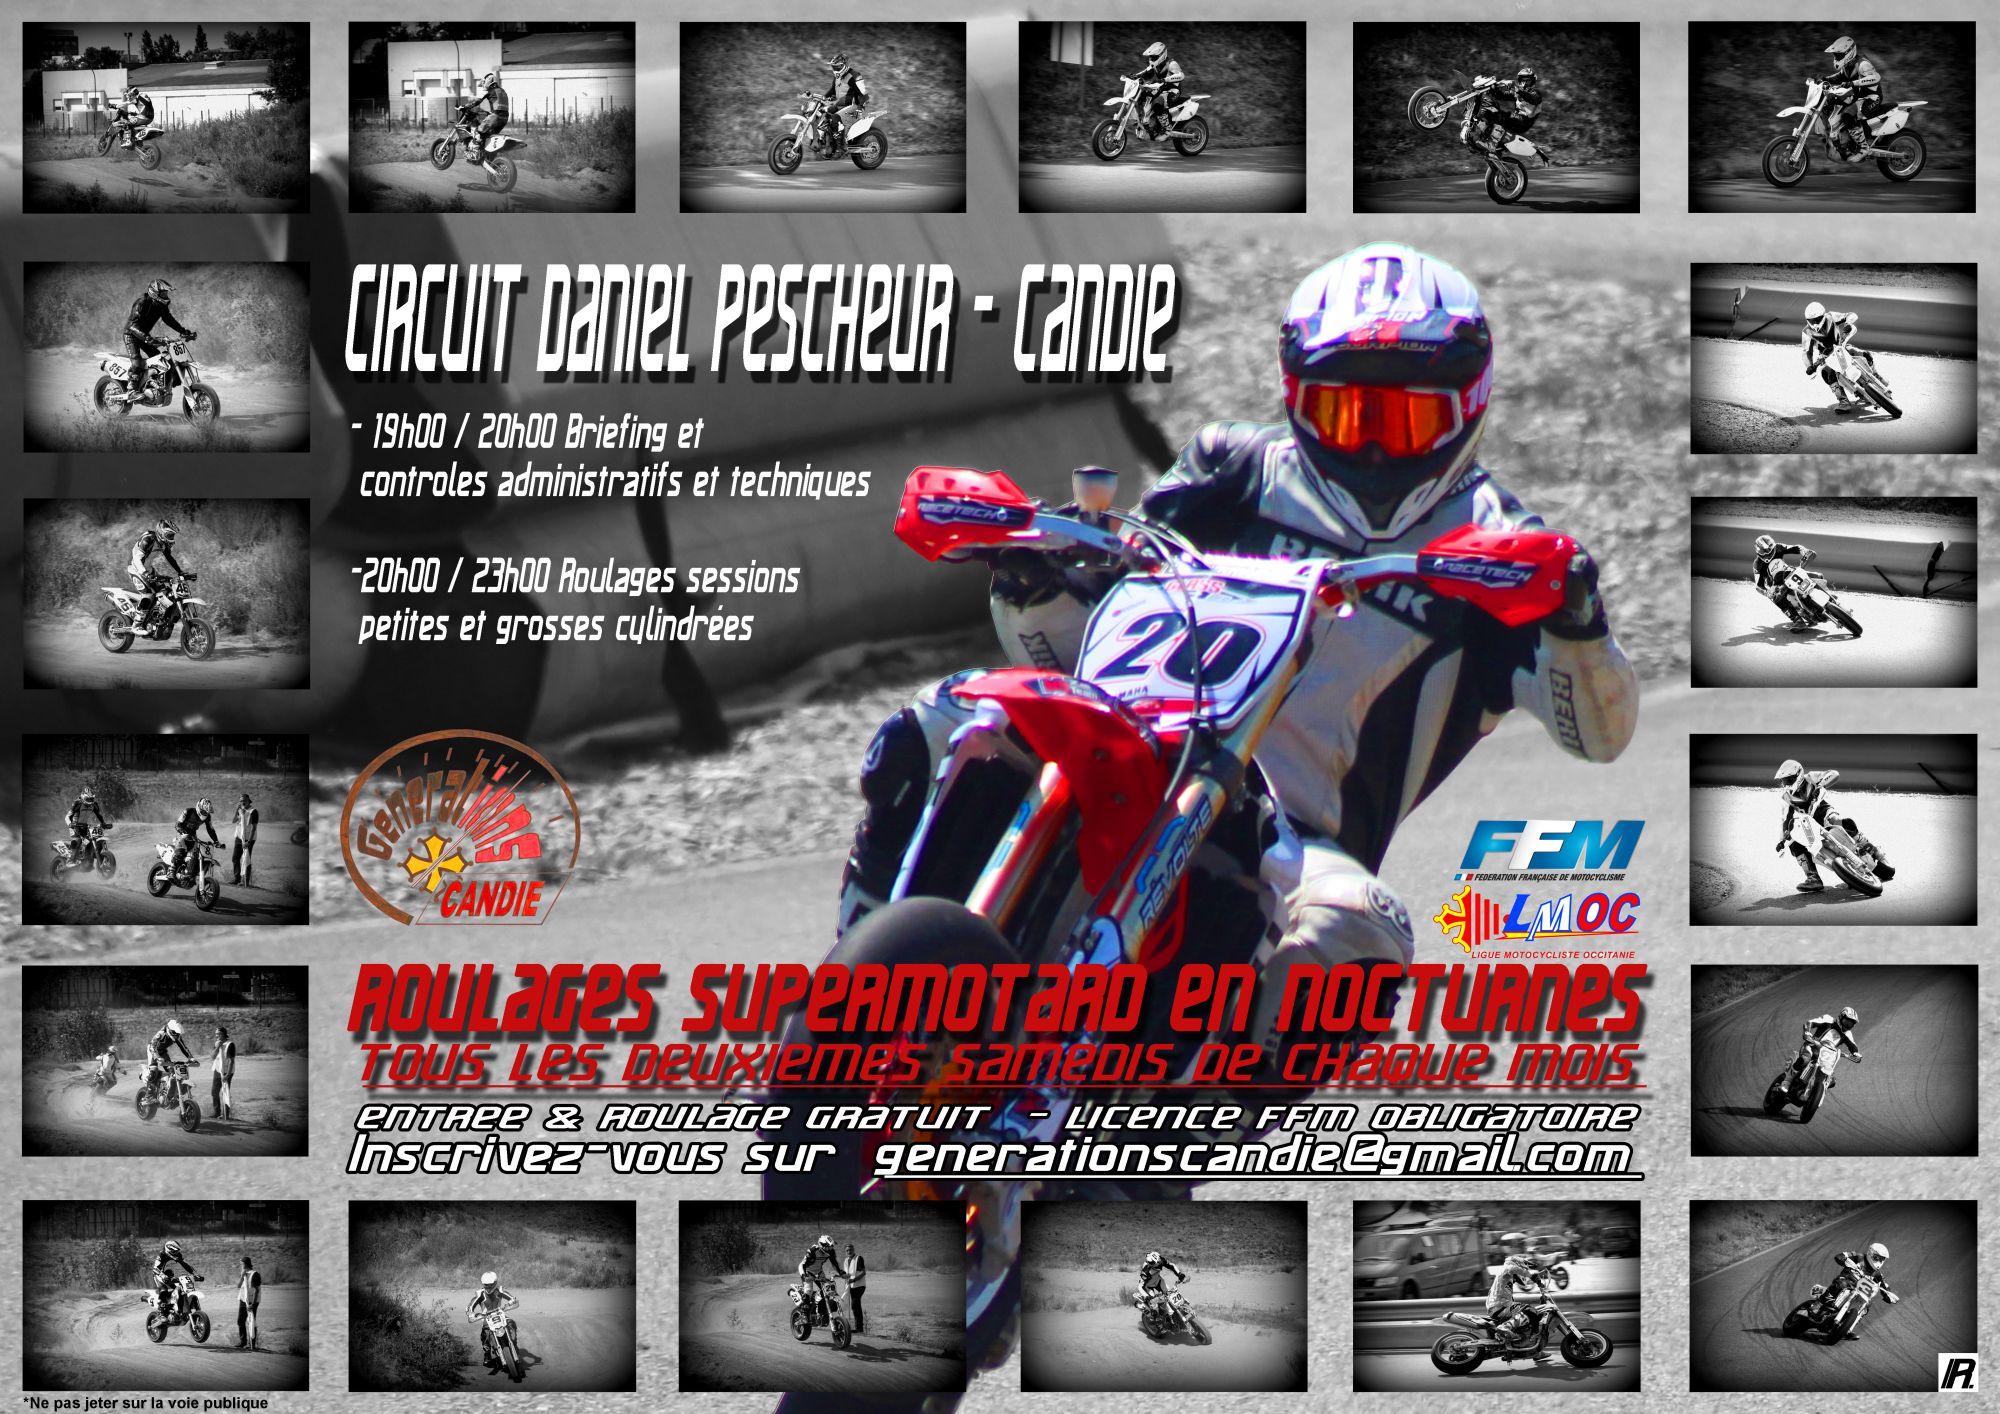 2019-02-26-roulage-2019-c3511-candie-moto-club